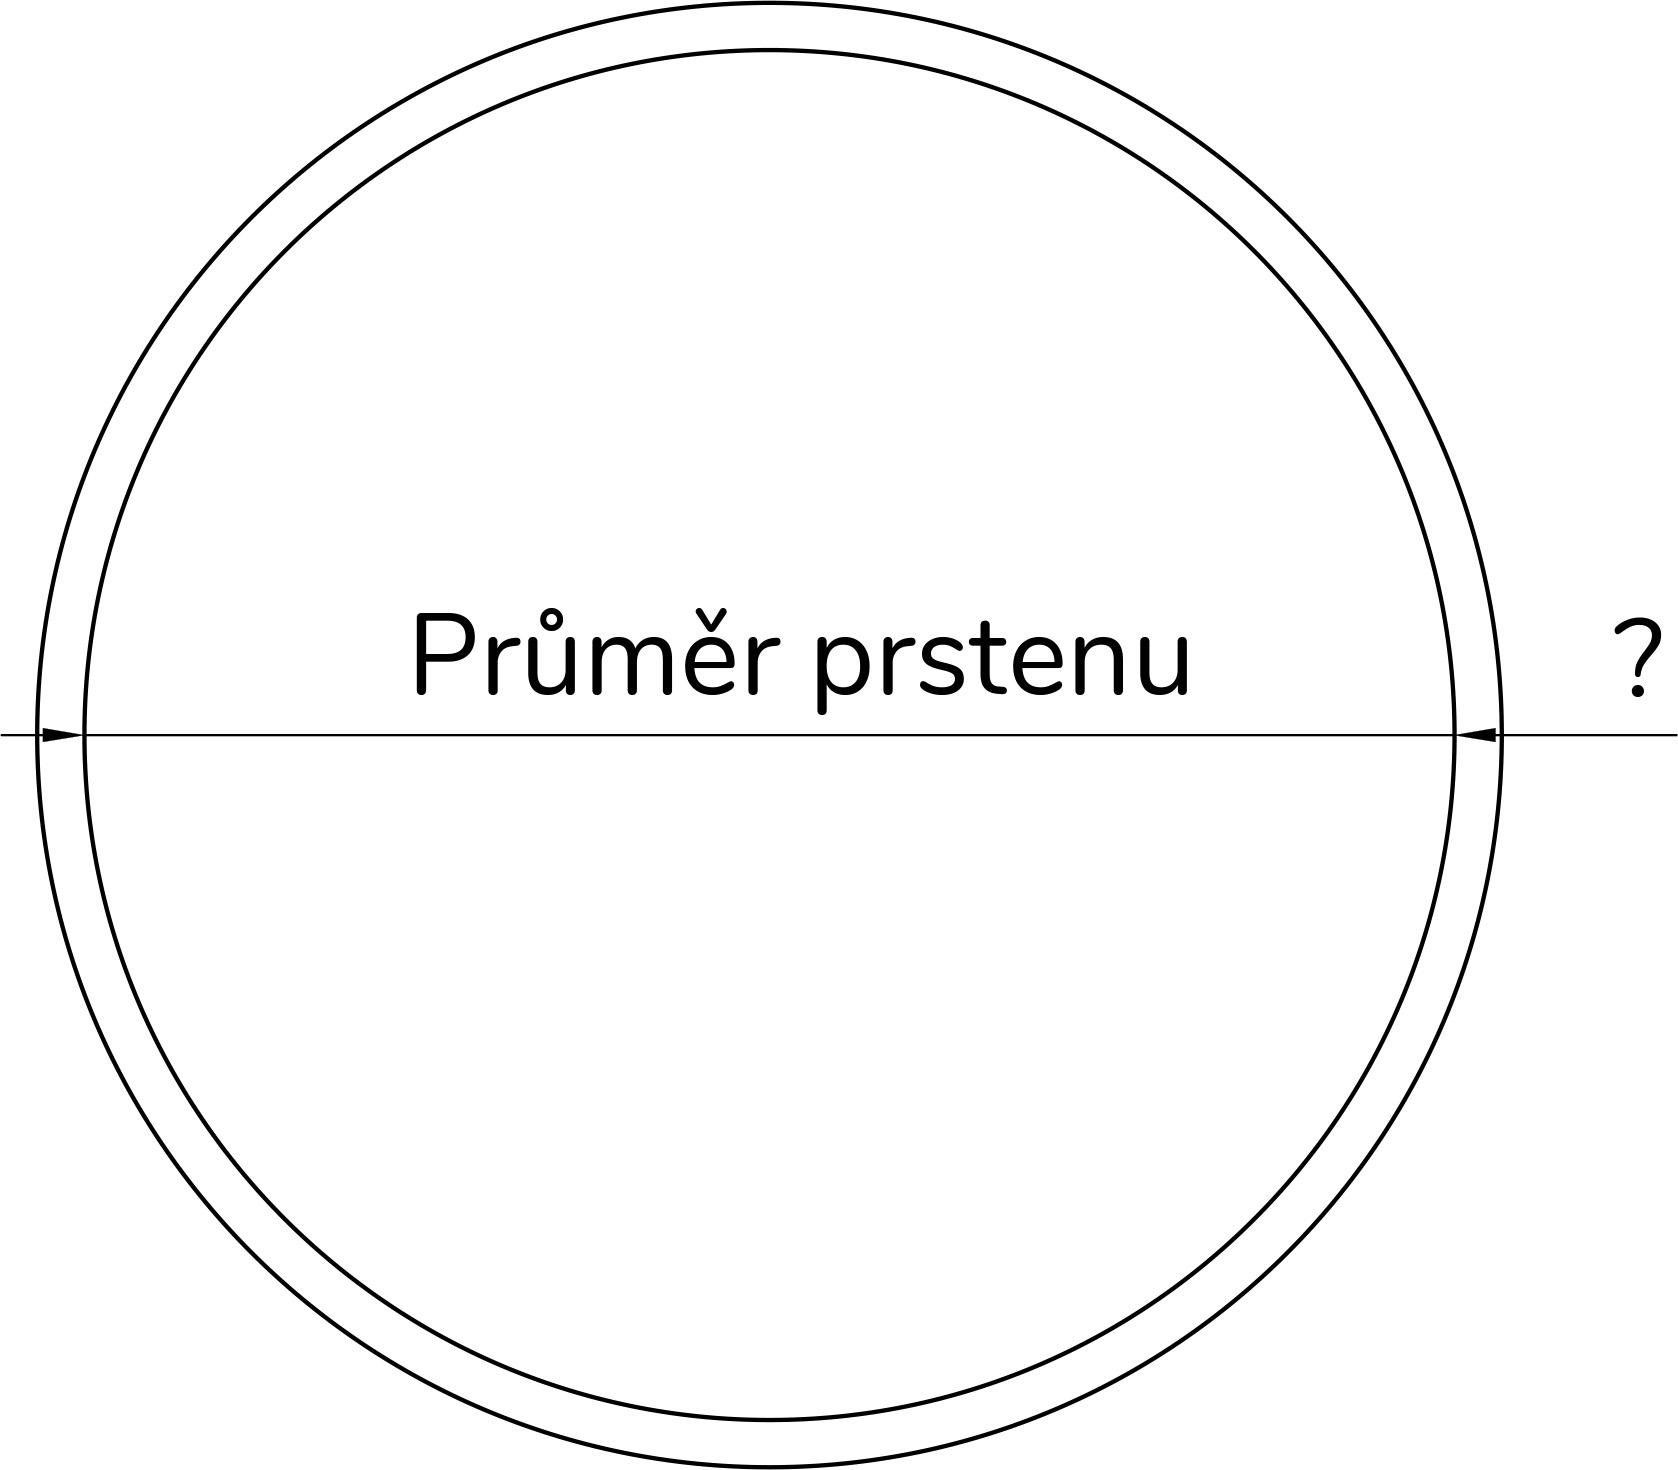 prumer_prstenu